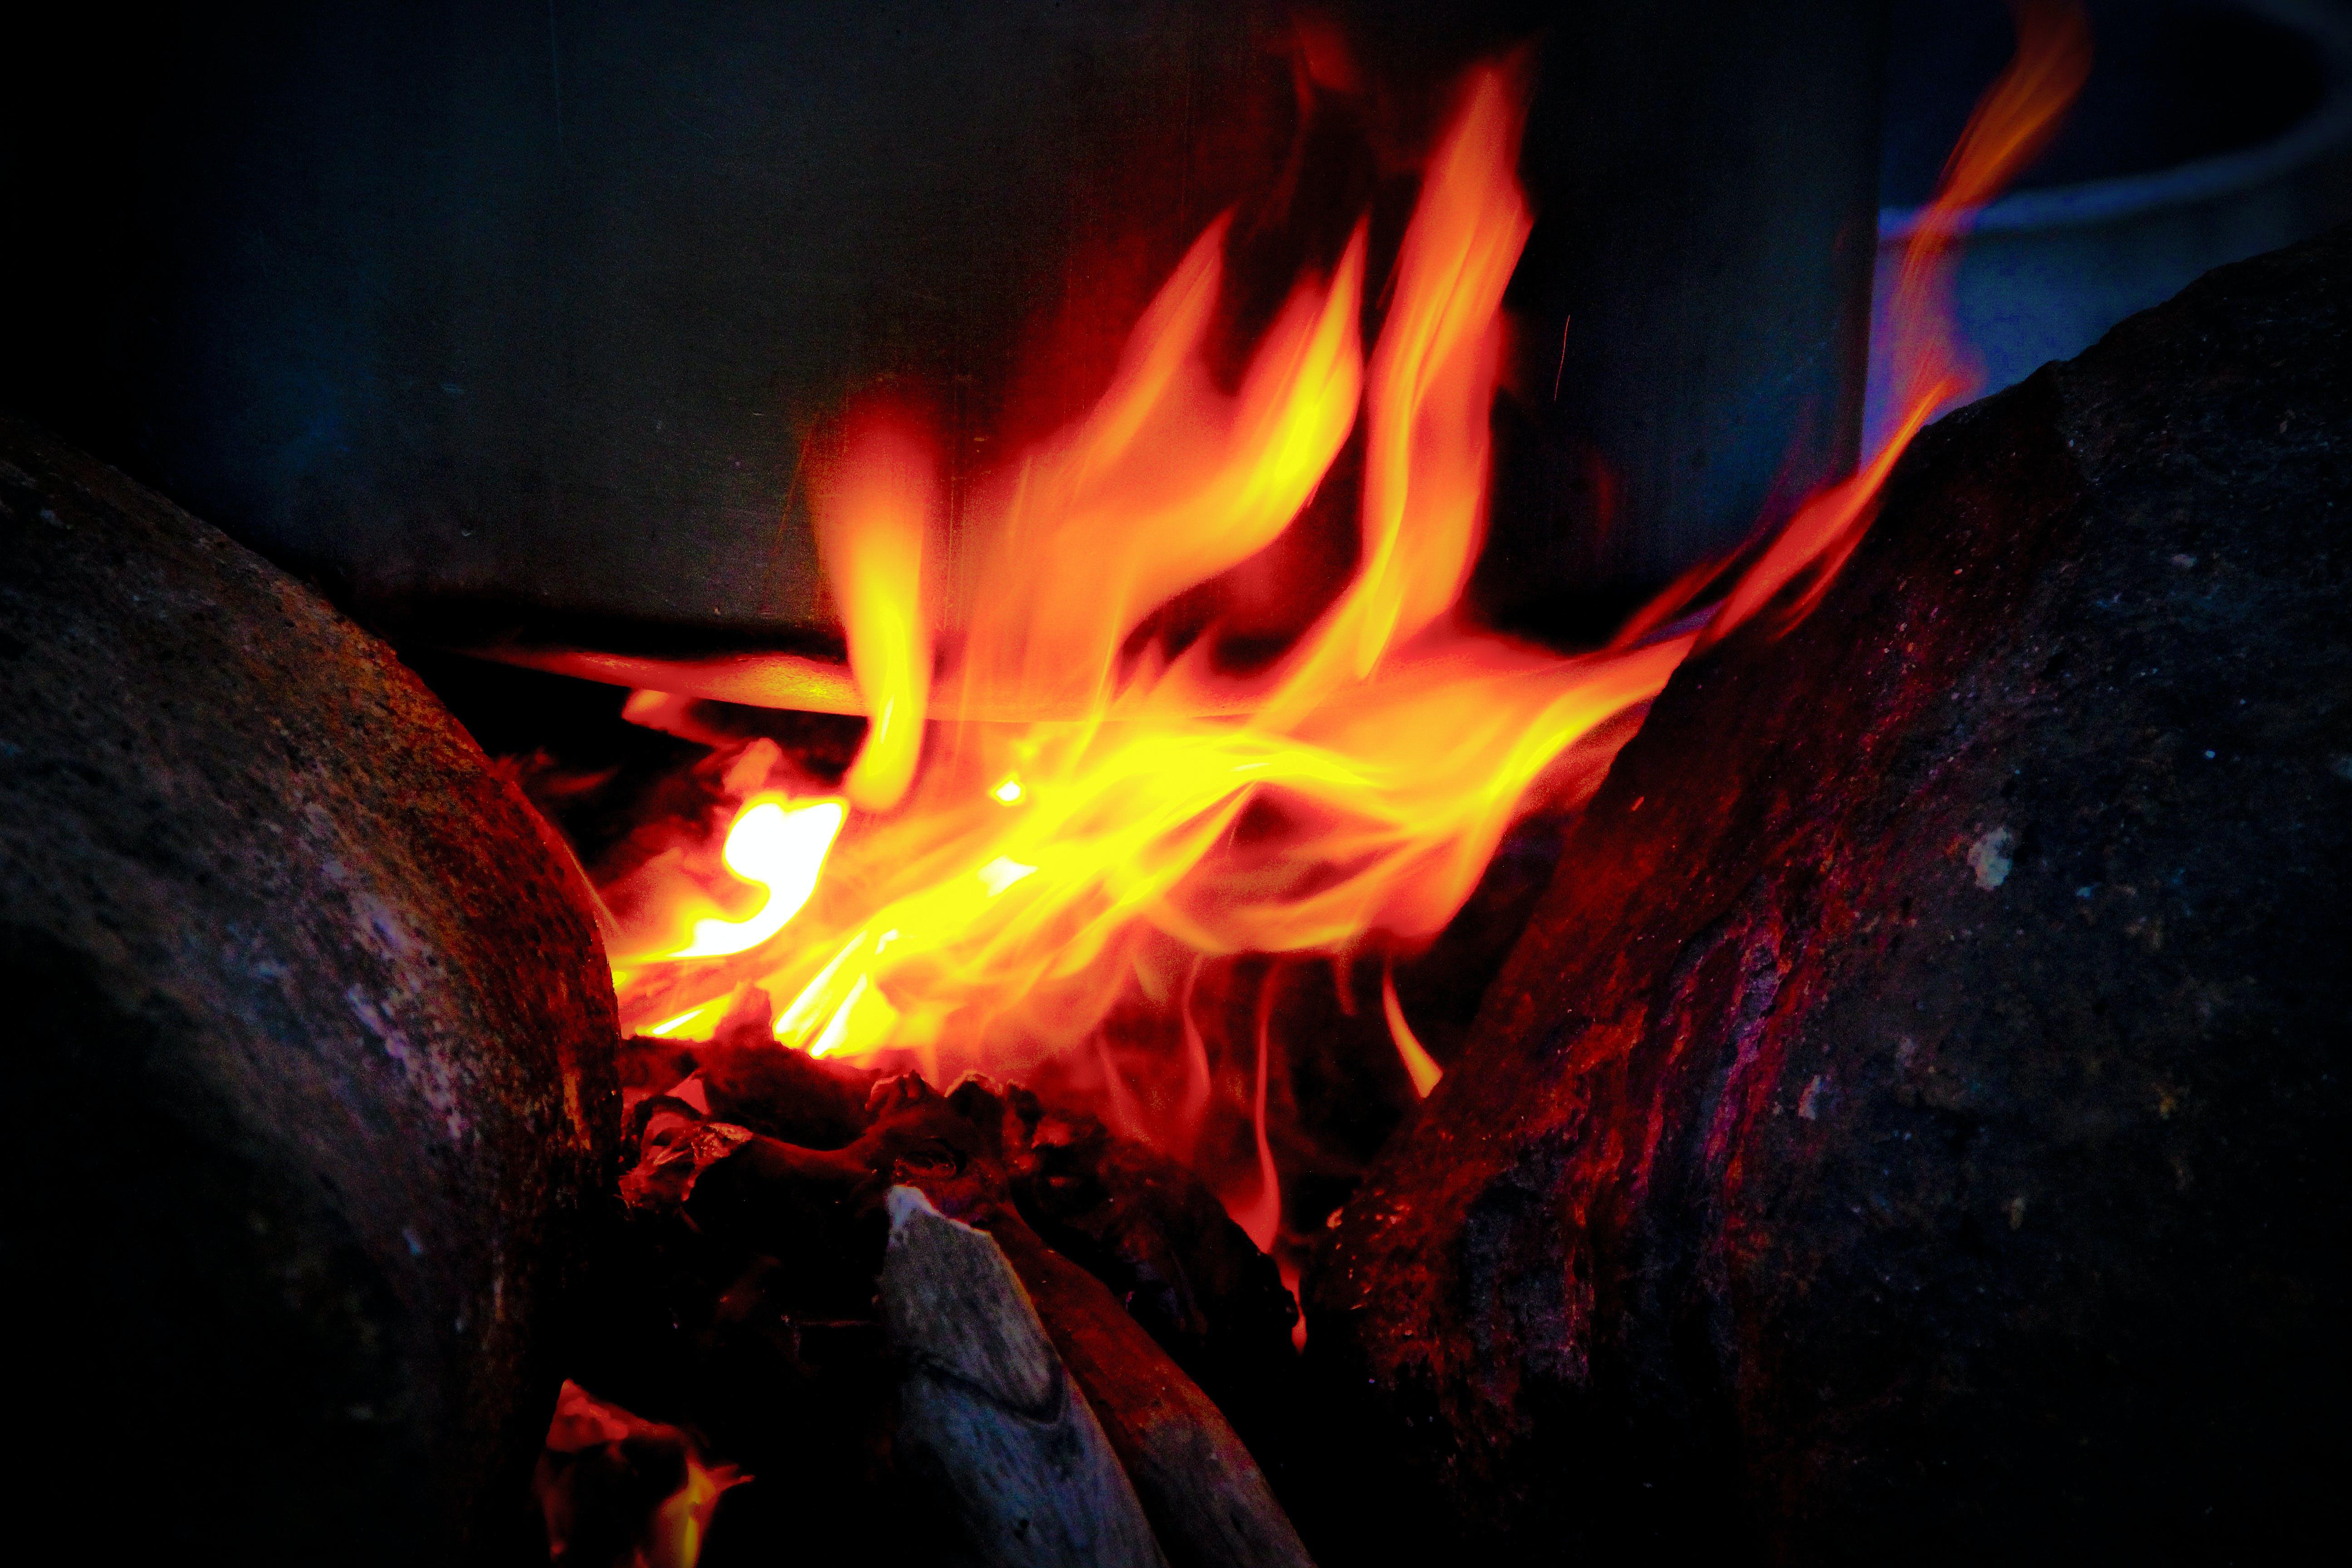 Kostenloses Stock Foto zu brand, feuer, flamme, hitze